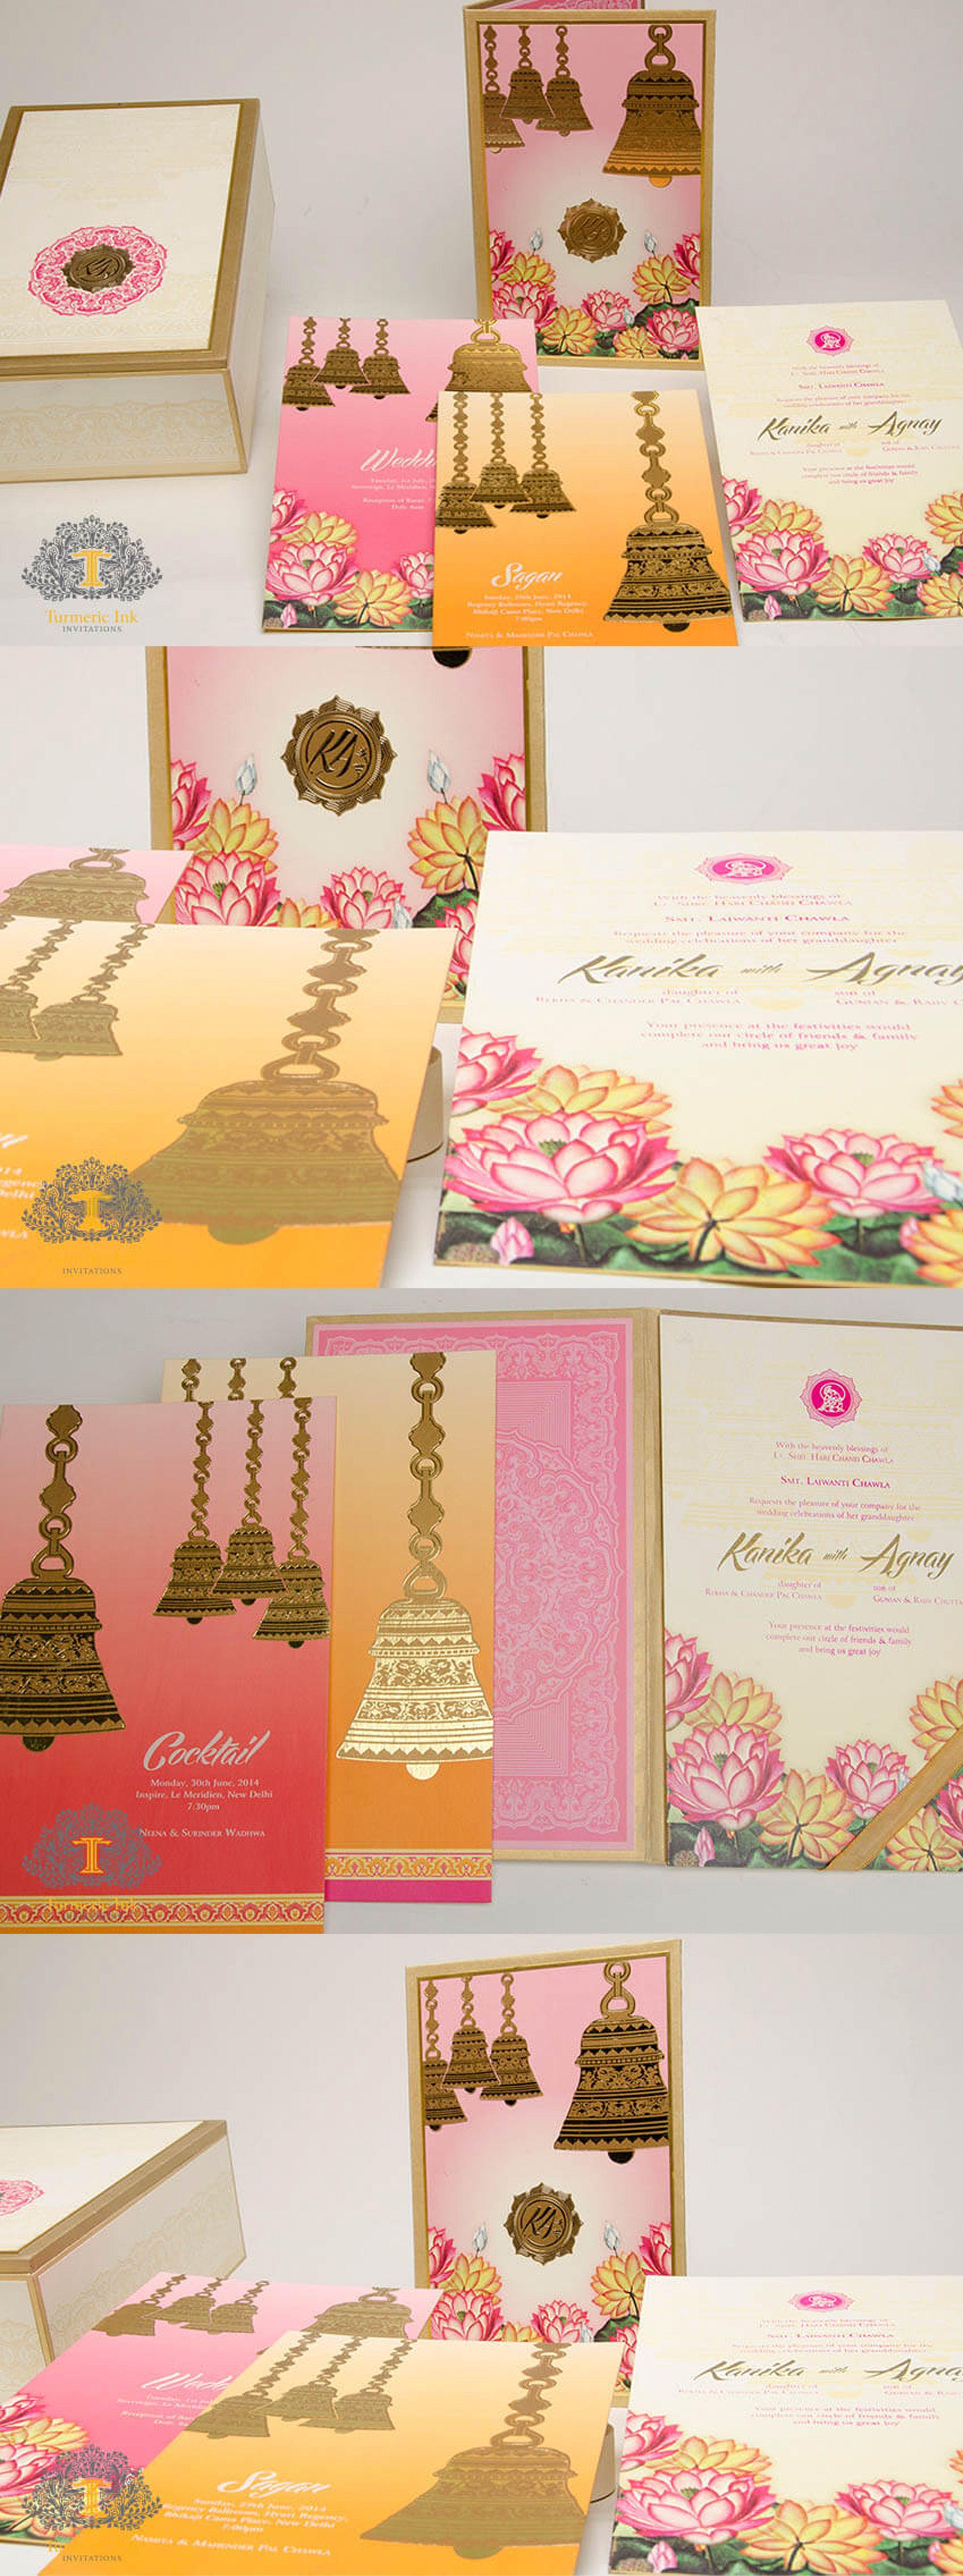 invite invitations Indian wedding invite wedding card bride indian